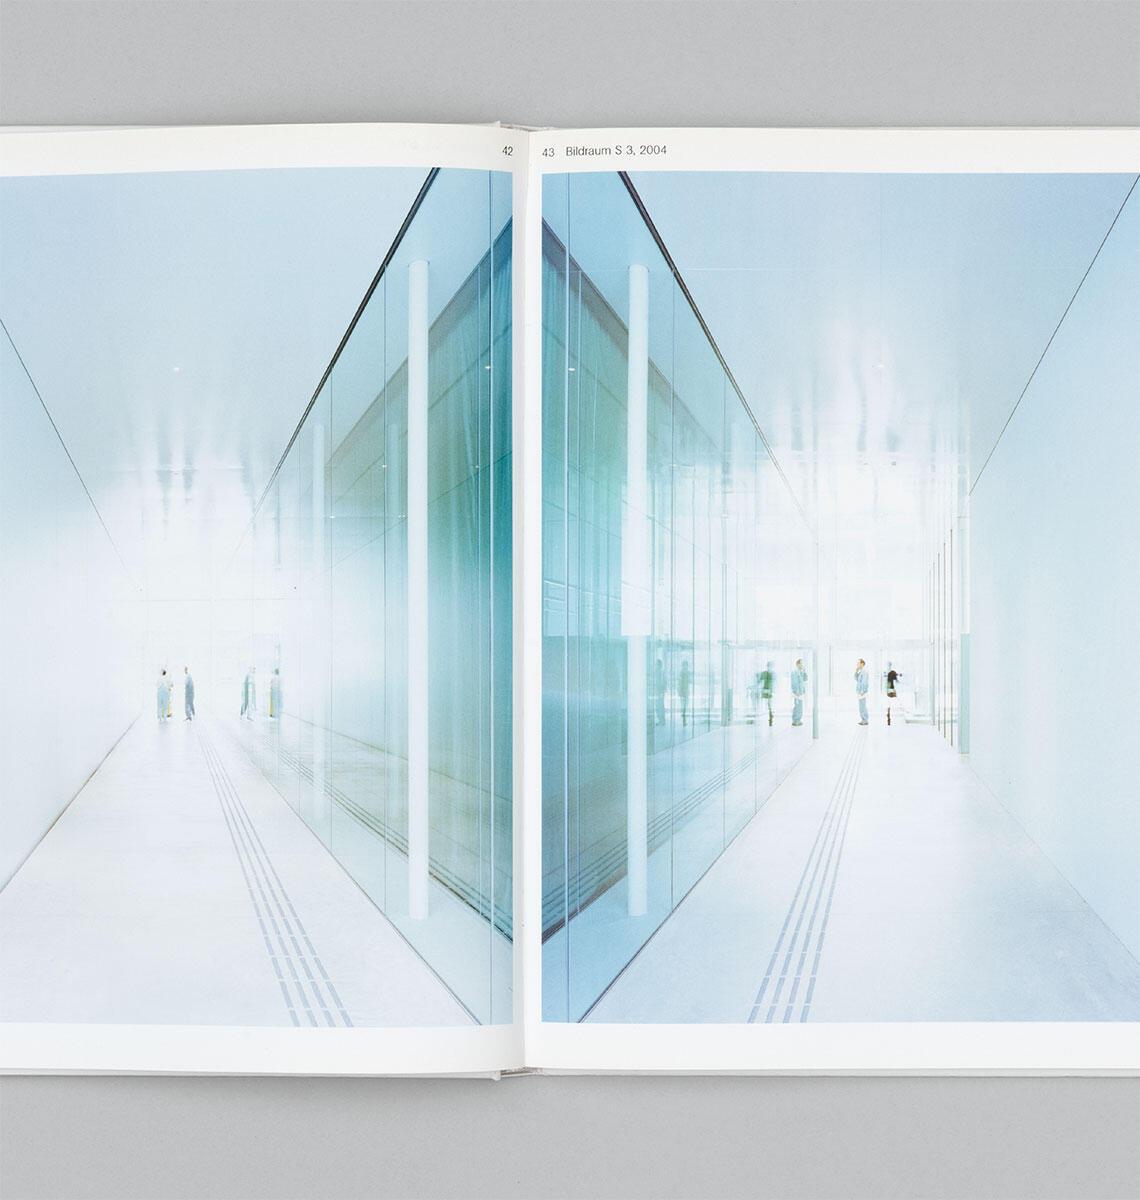 Moritz Küng (Hg.), Walter Niedermayr / Kazuyo Sejima + Ryue Nishizawa / Sanaa Foto: Walter Niedermayr, Bildraum S 3 Bild: Roberto Ruiz